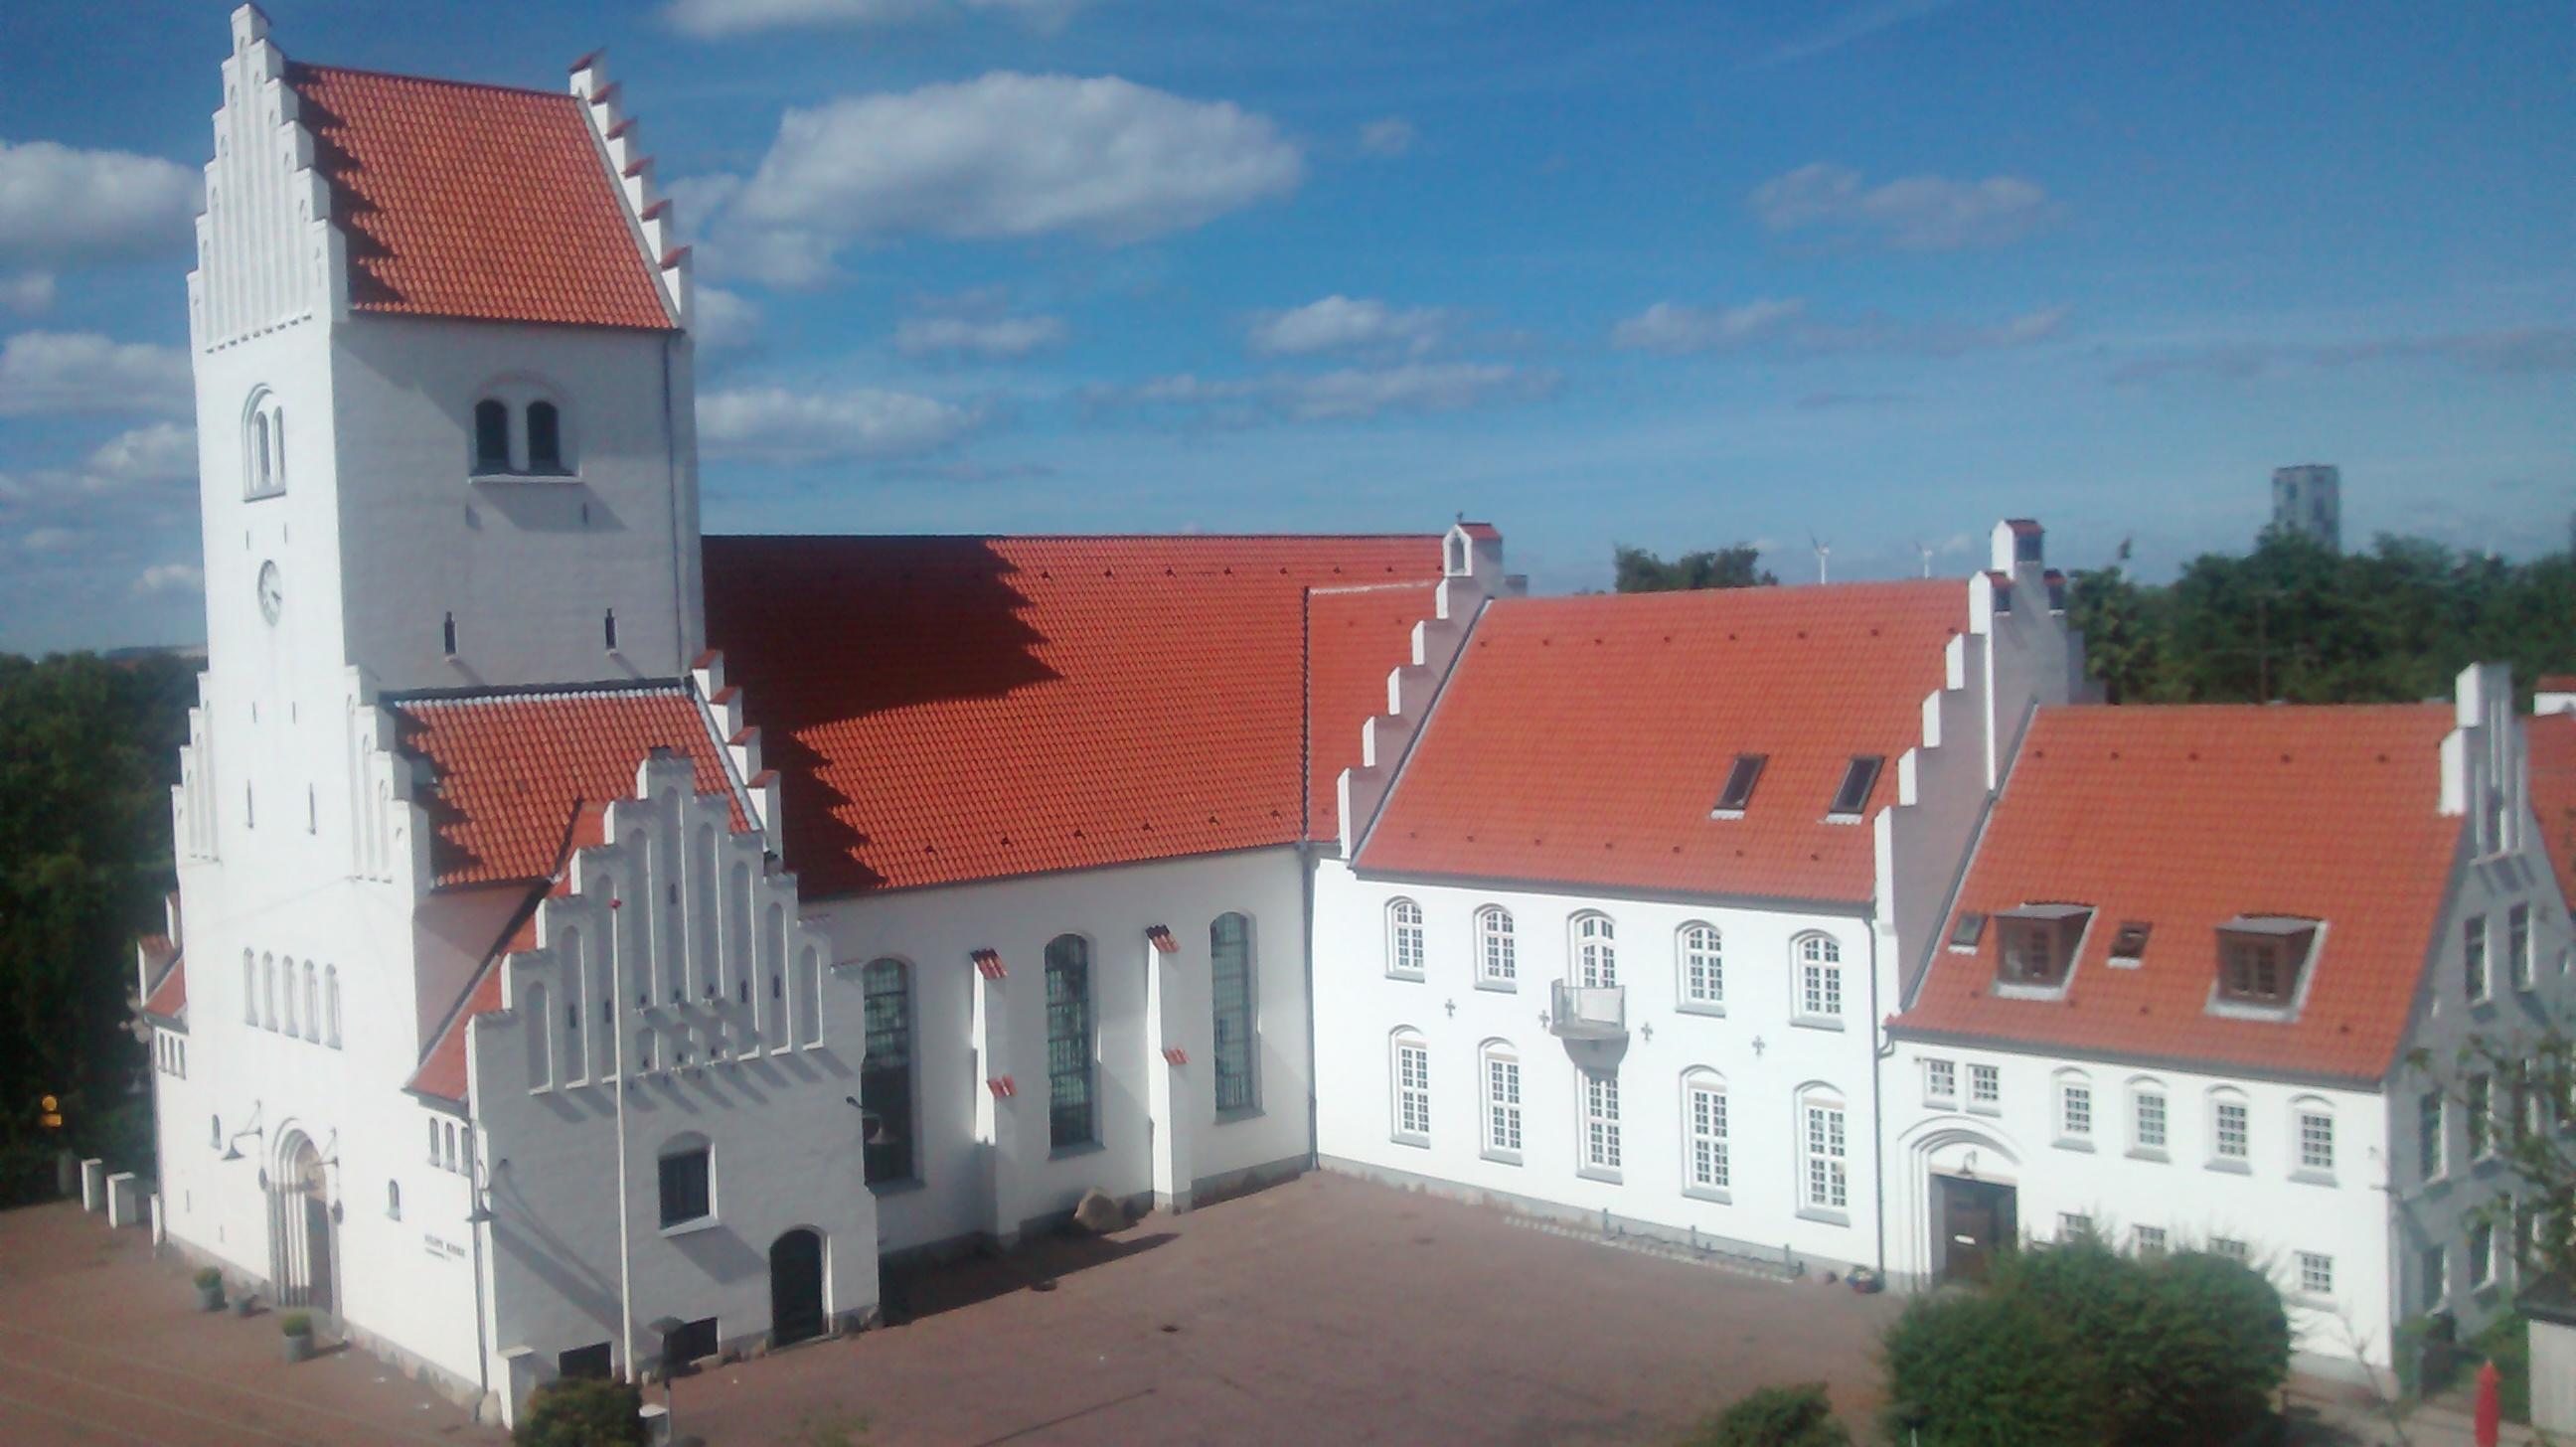 Filips Kirke, København